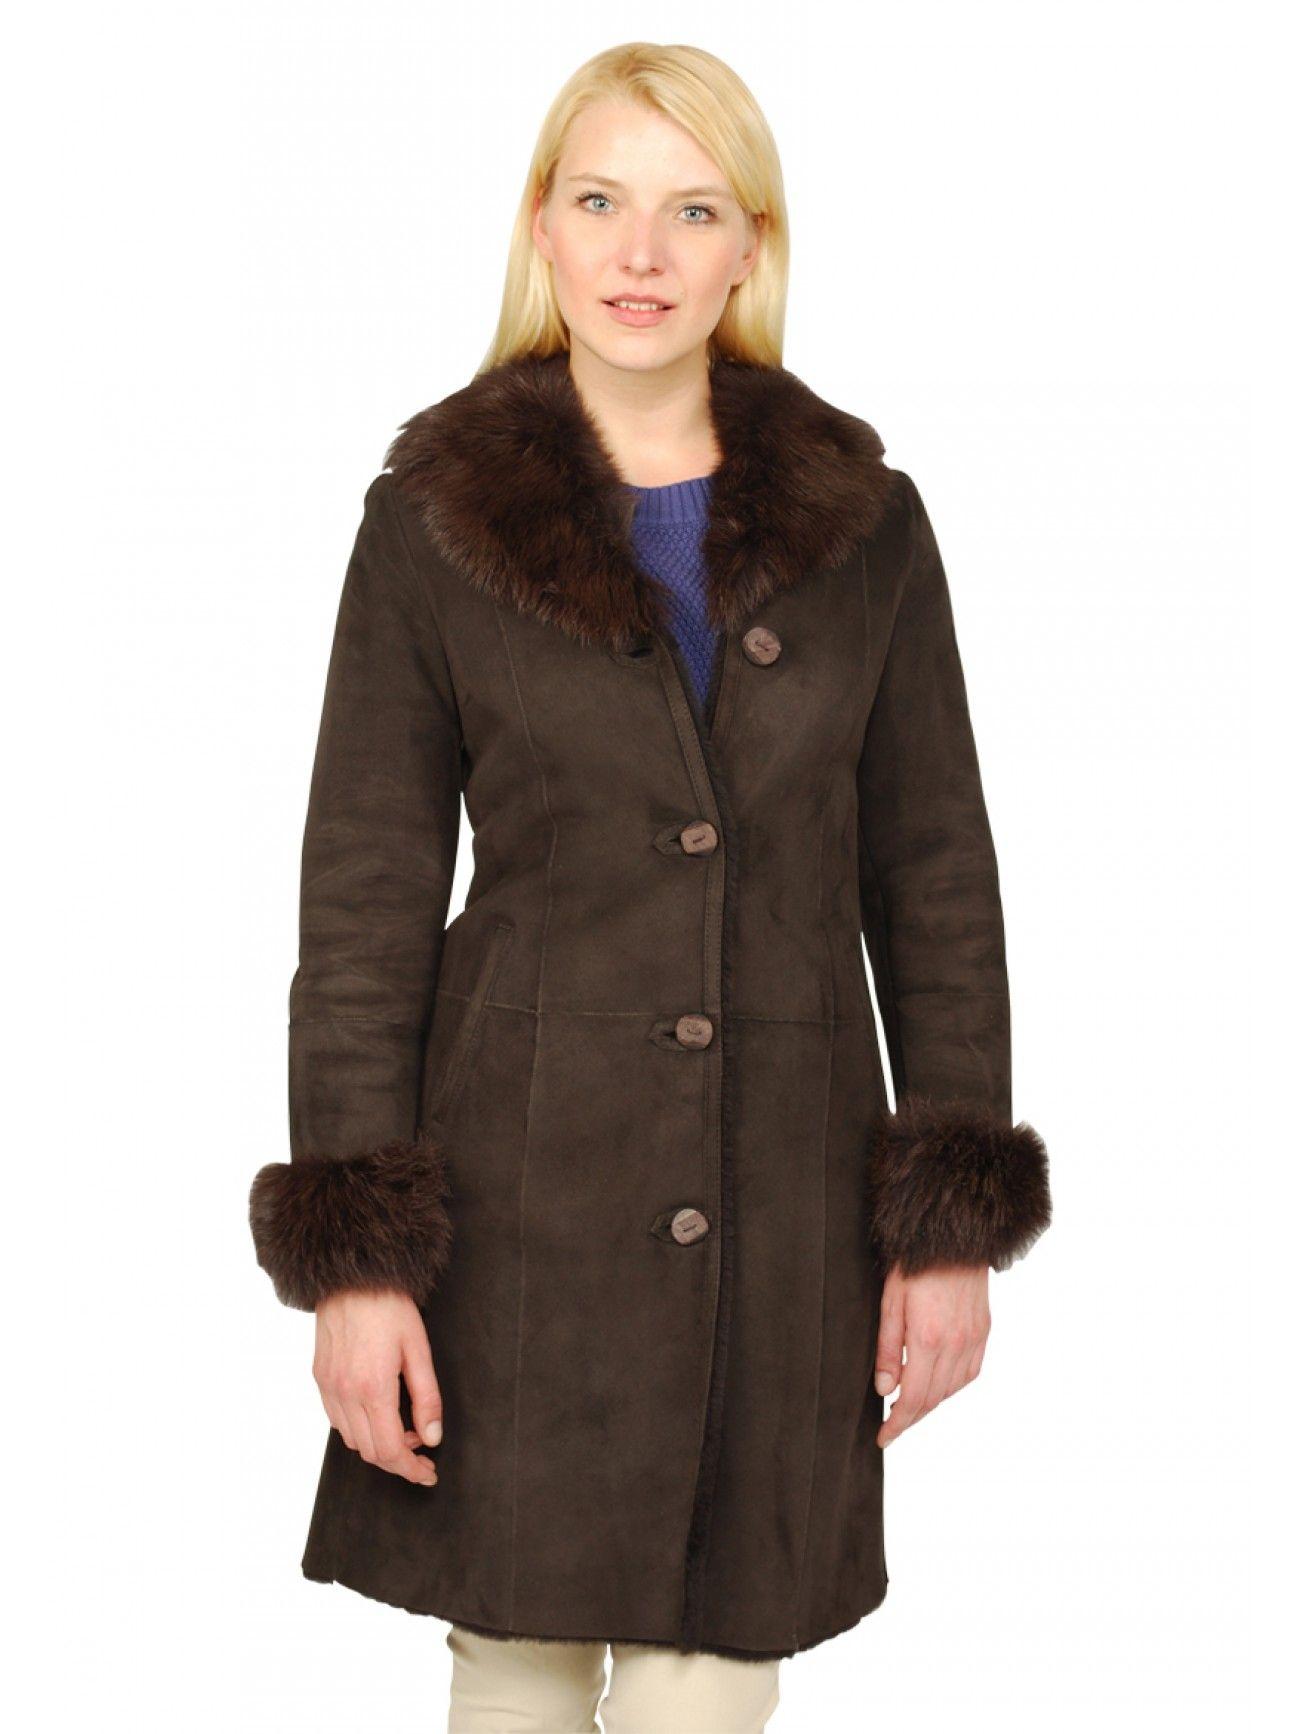 Dahlia Shearling Coat 100% Genuine Spanish Merino Shearling Coat ...